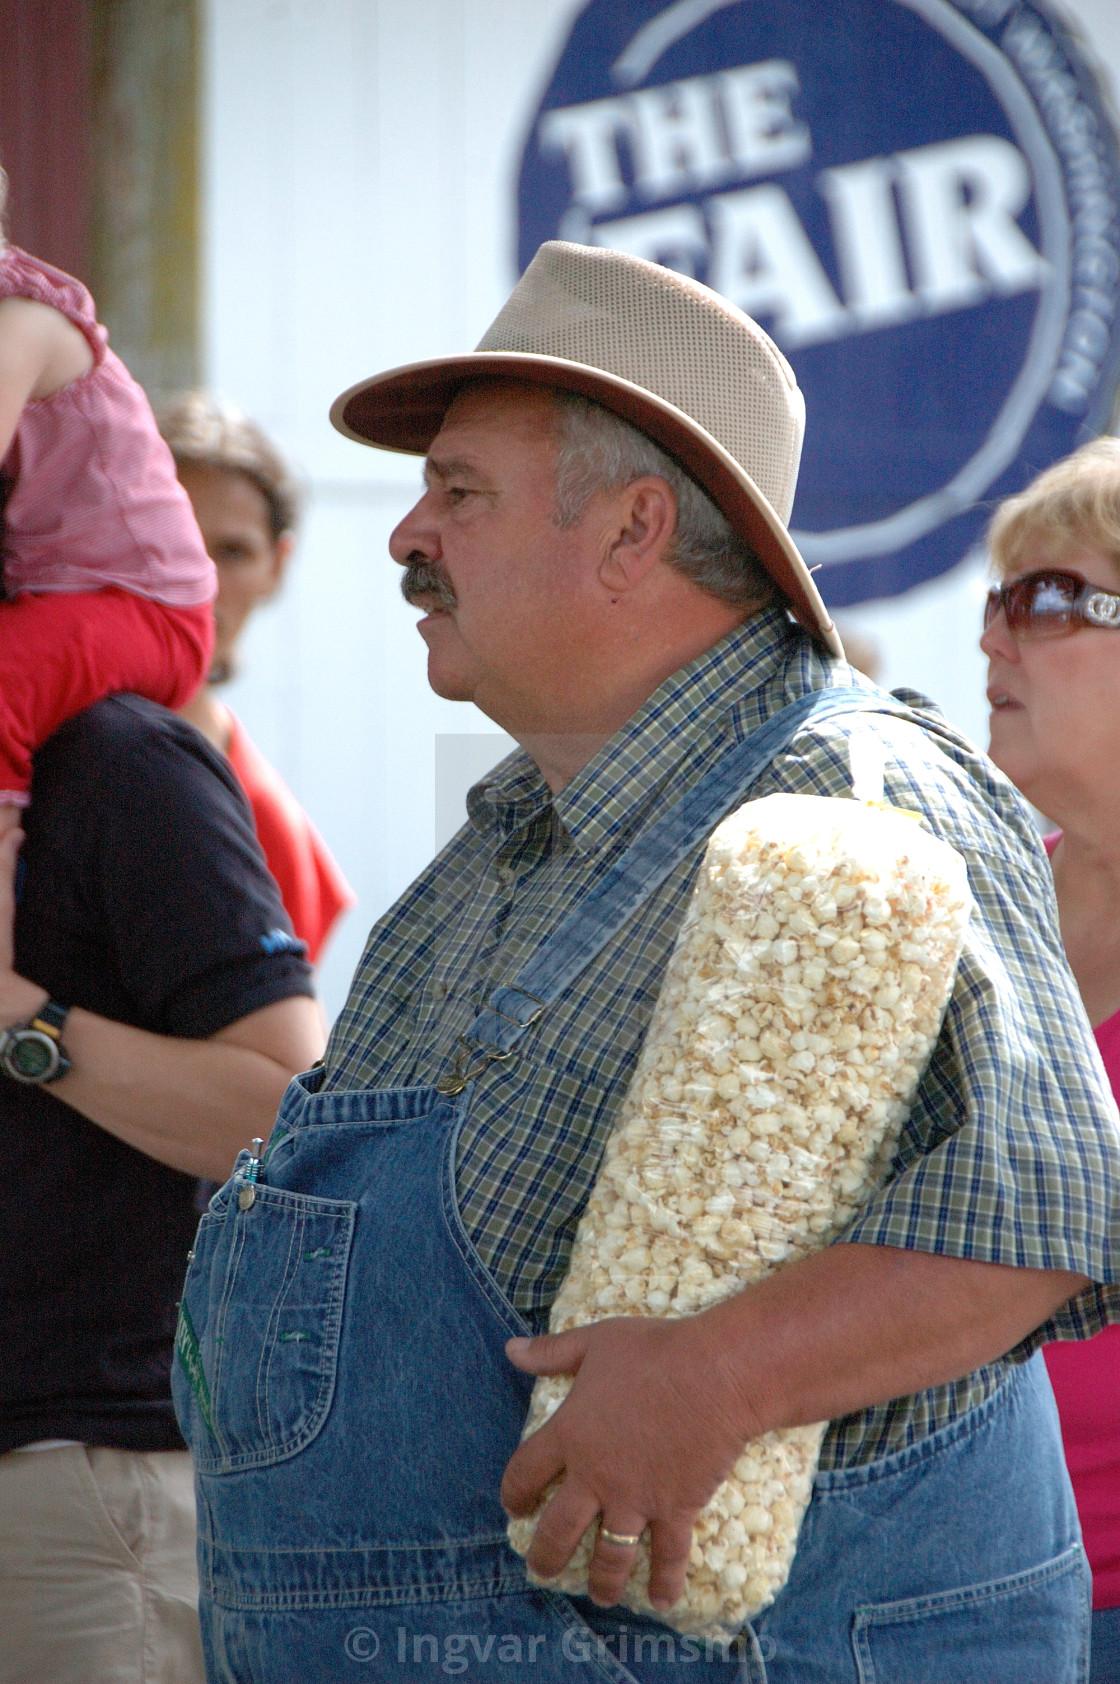 """County fair goer enjoying popcorn"" stock image"